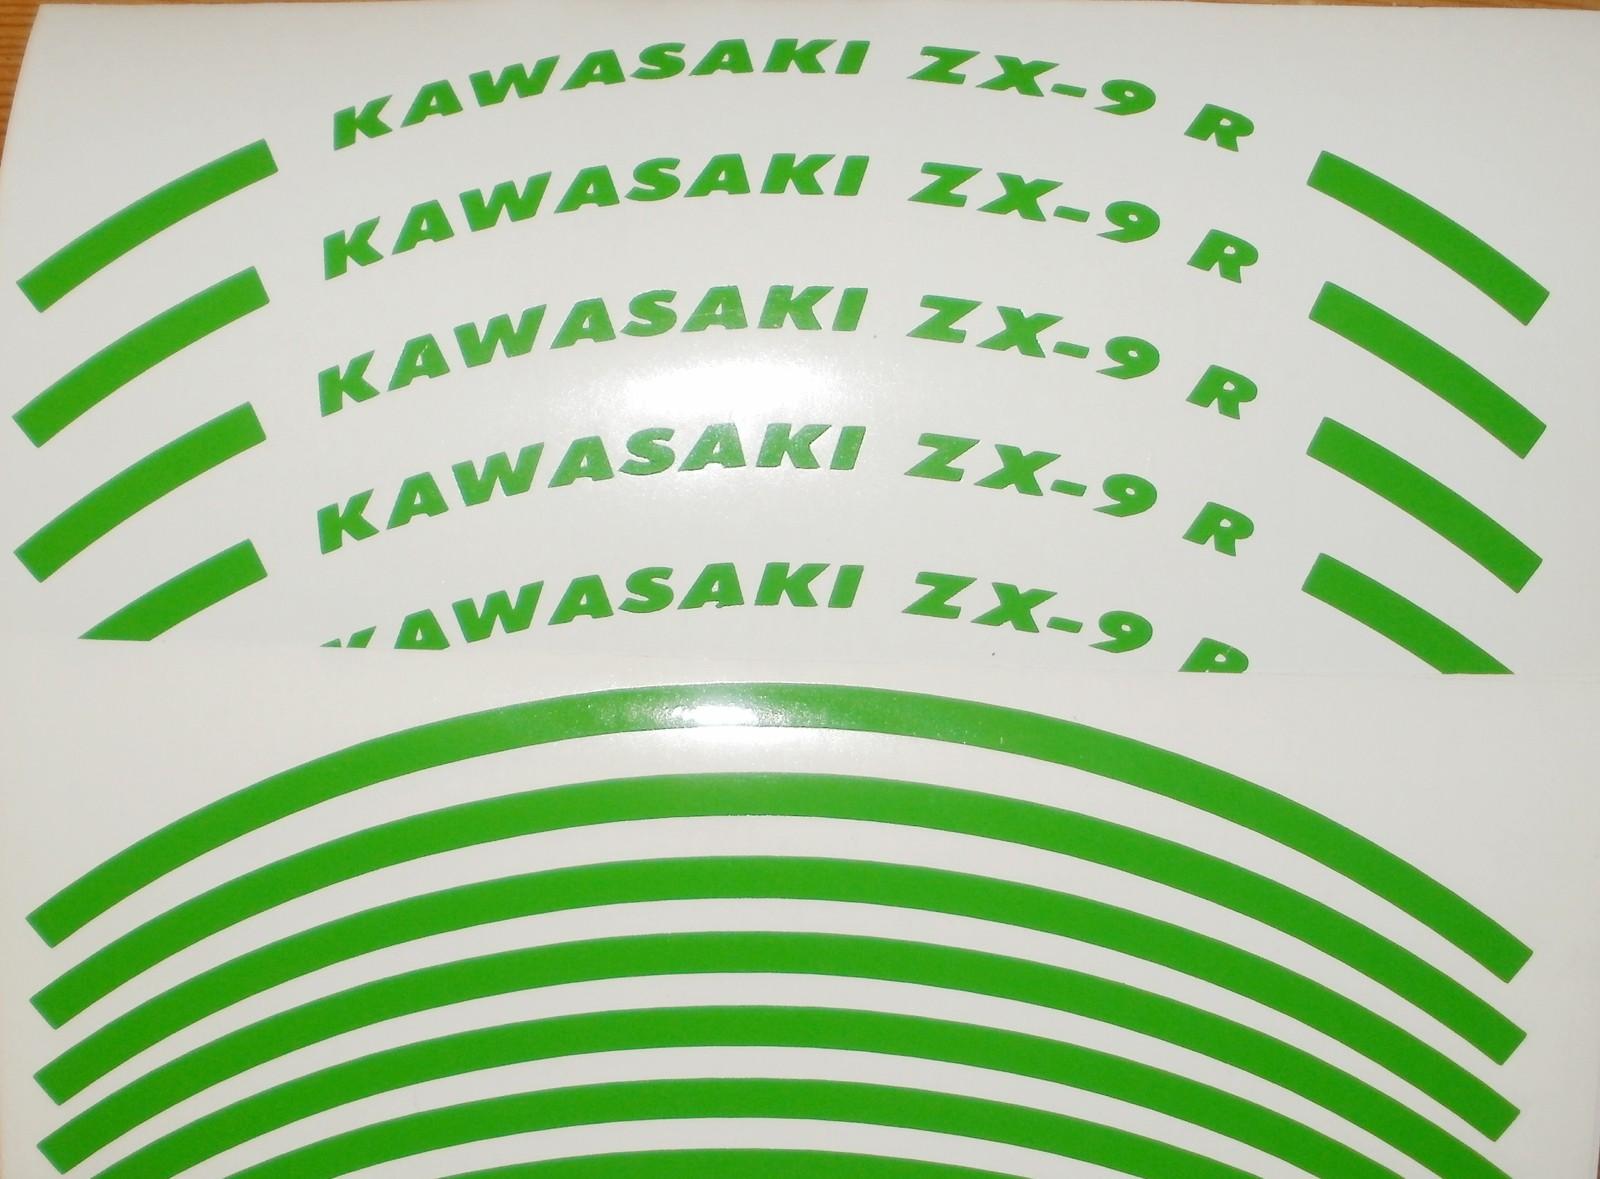 Felgenrandaufkleber Kawasaki ZX-9 R Grün